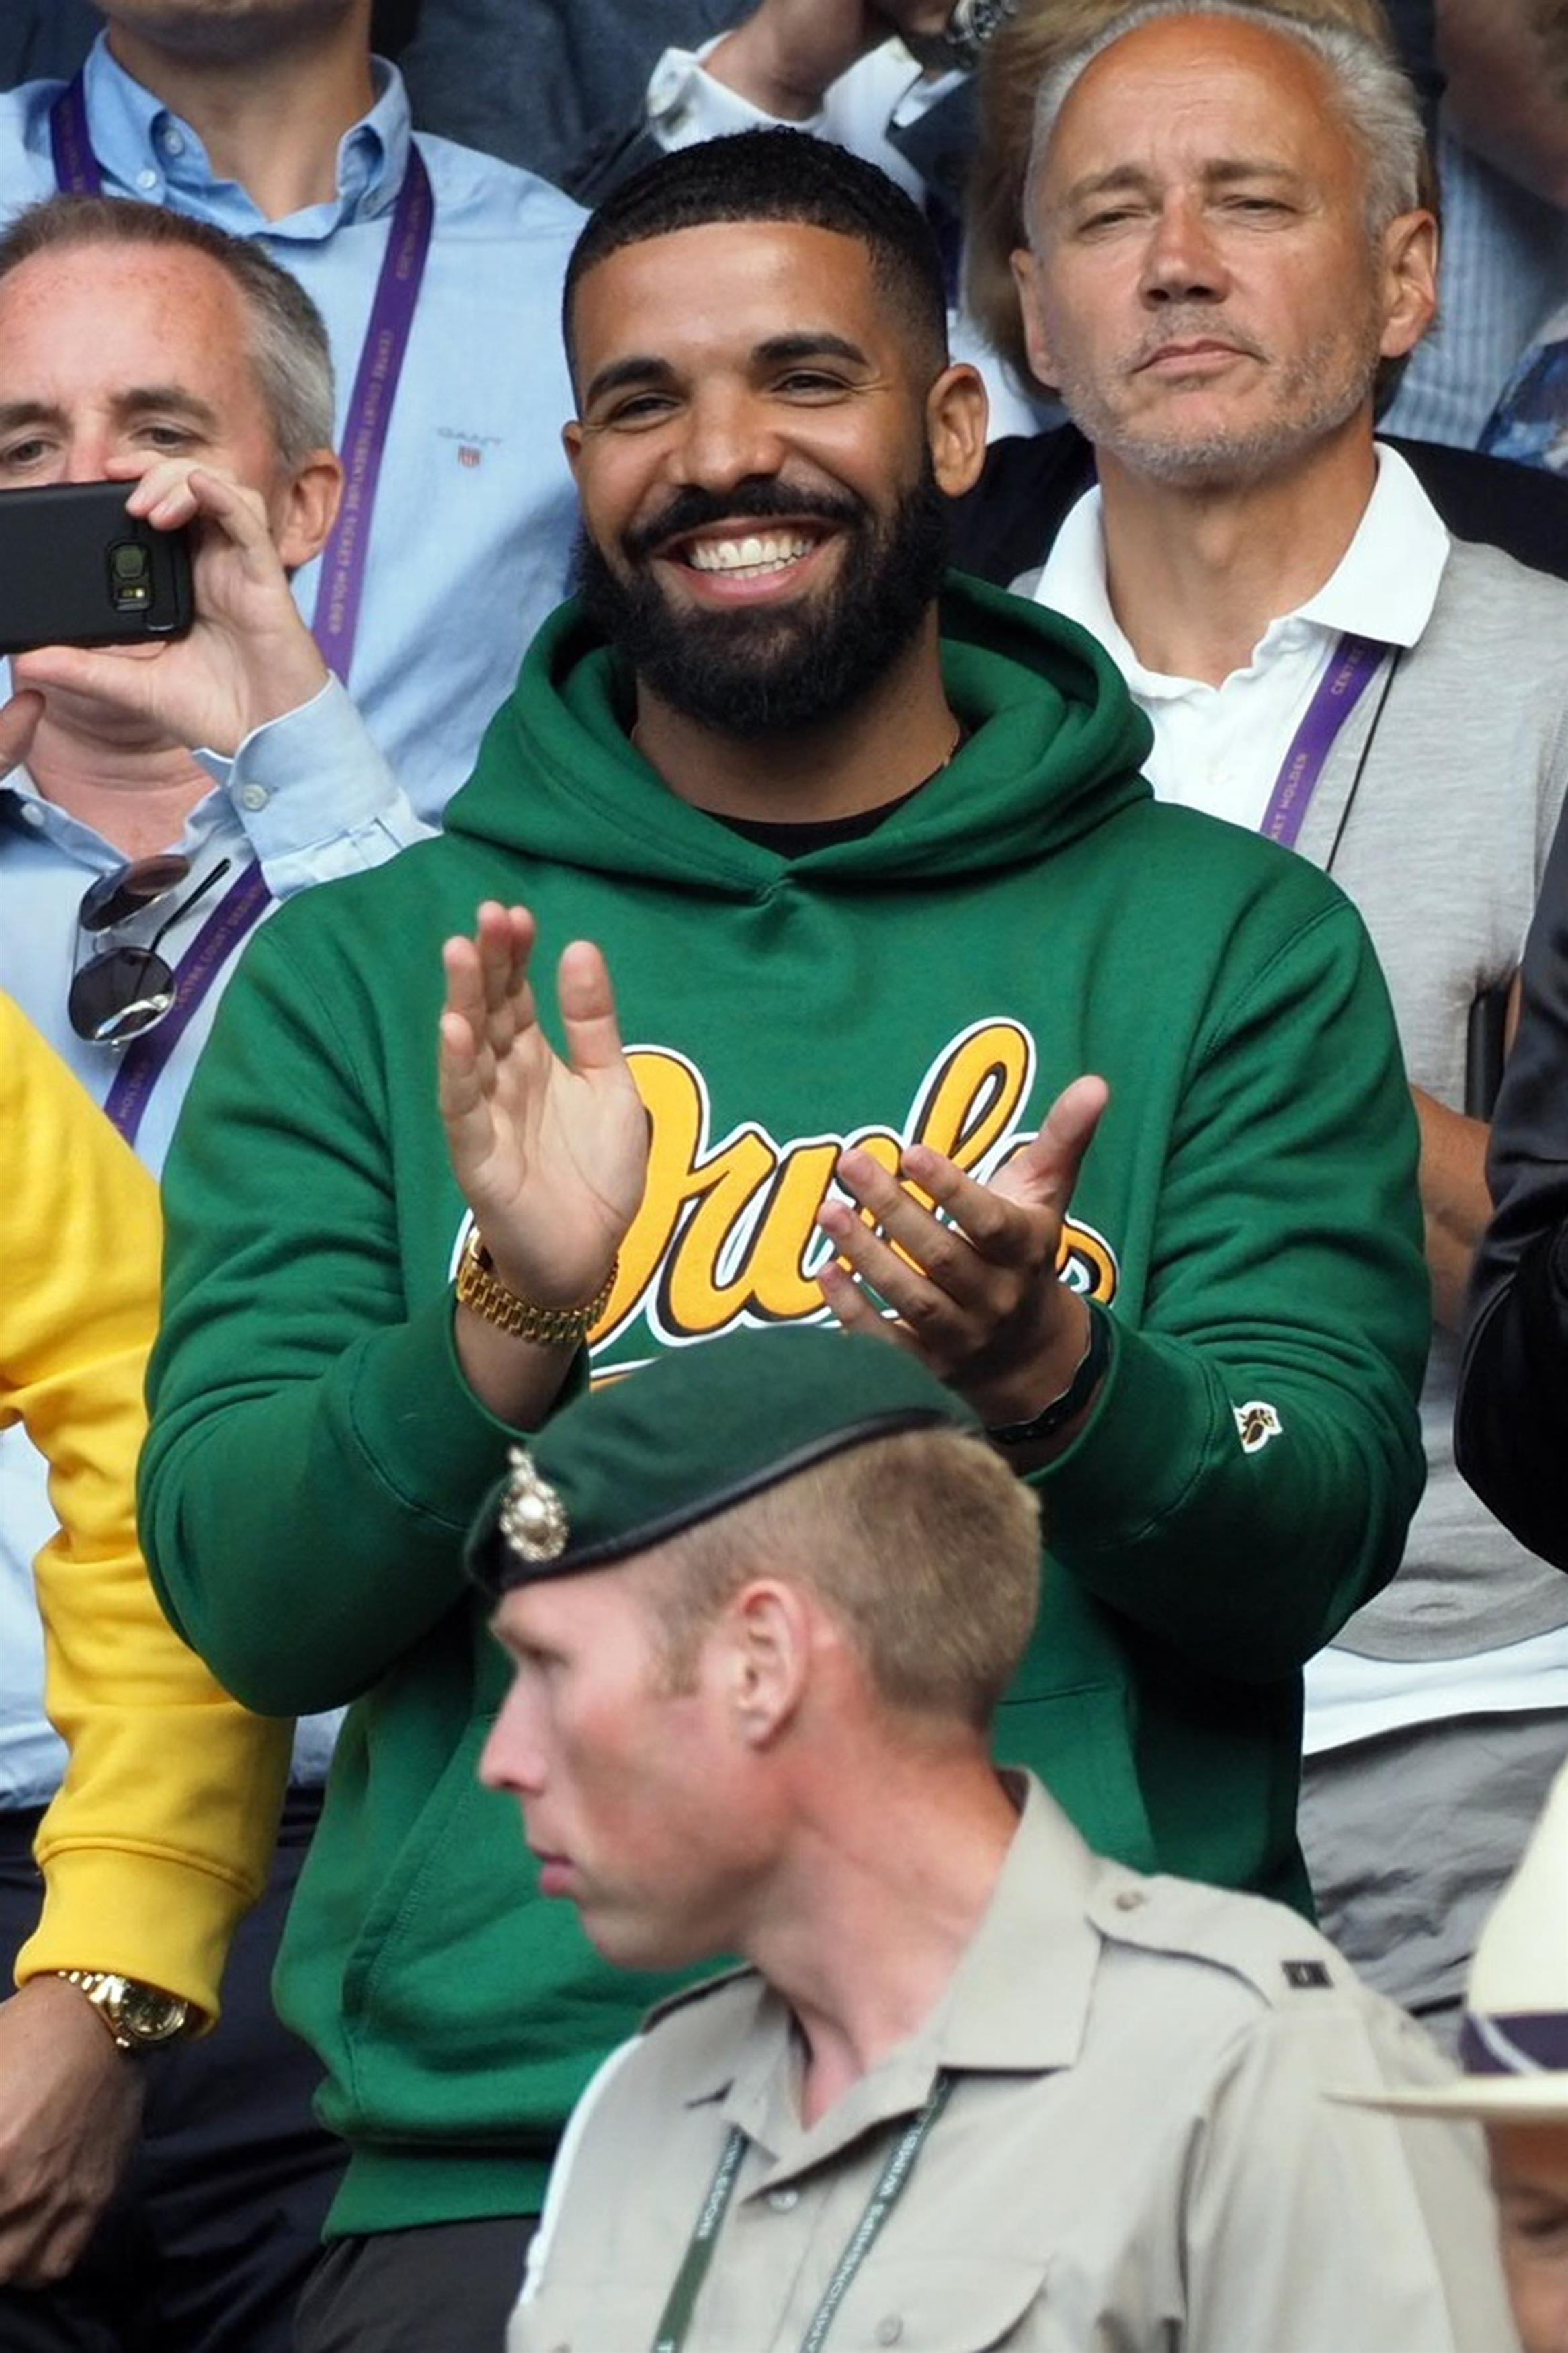 Drake sues woman over false pregnancy, rape claims